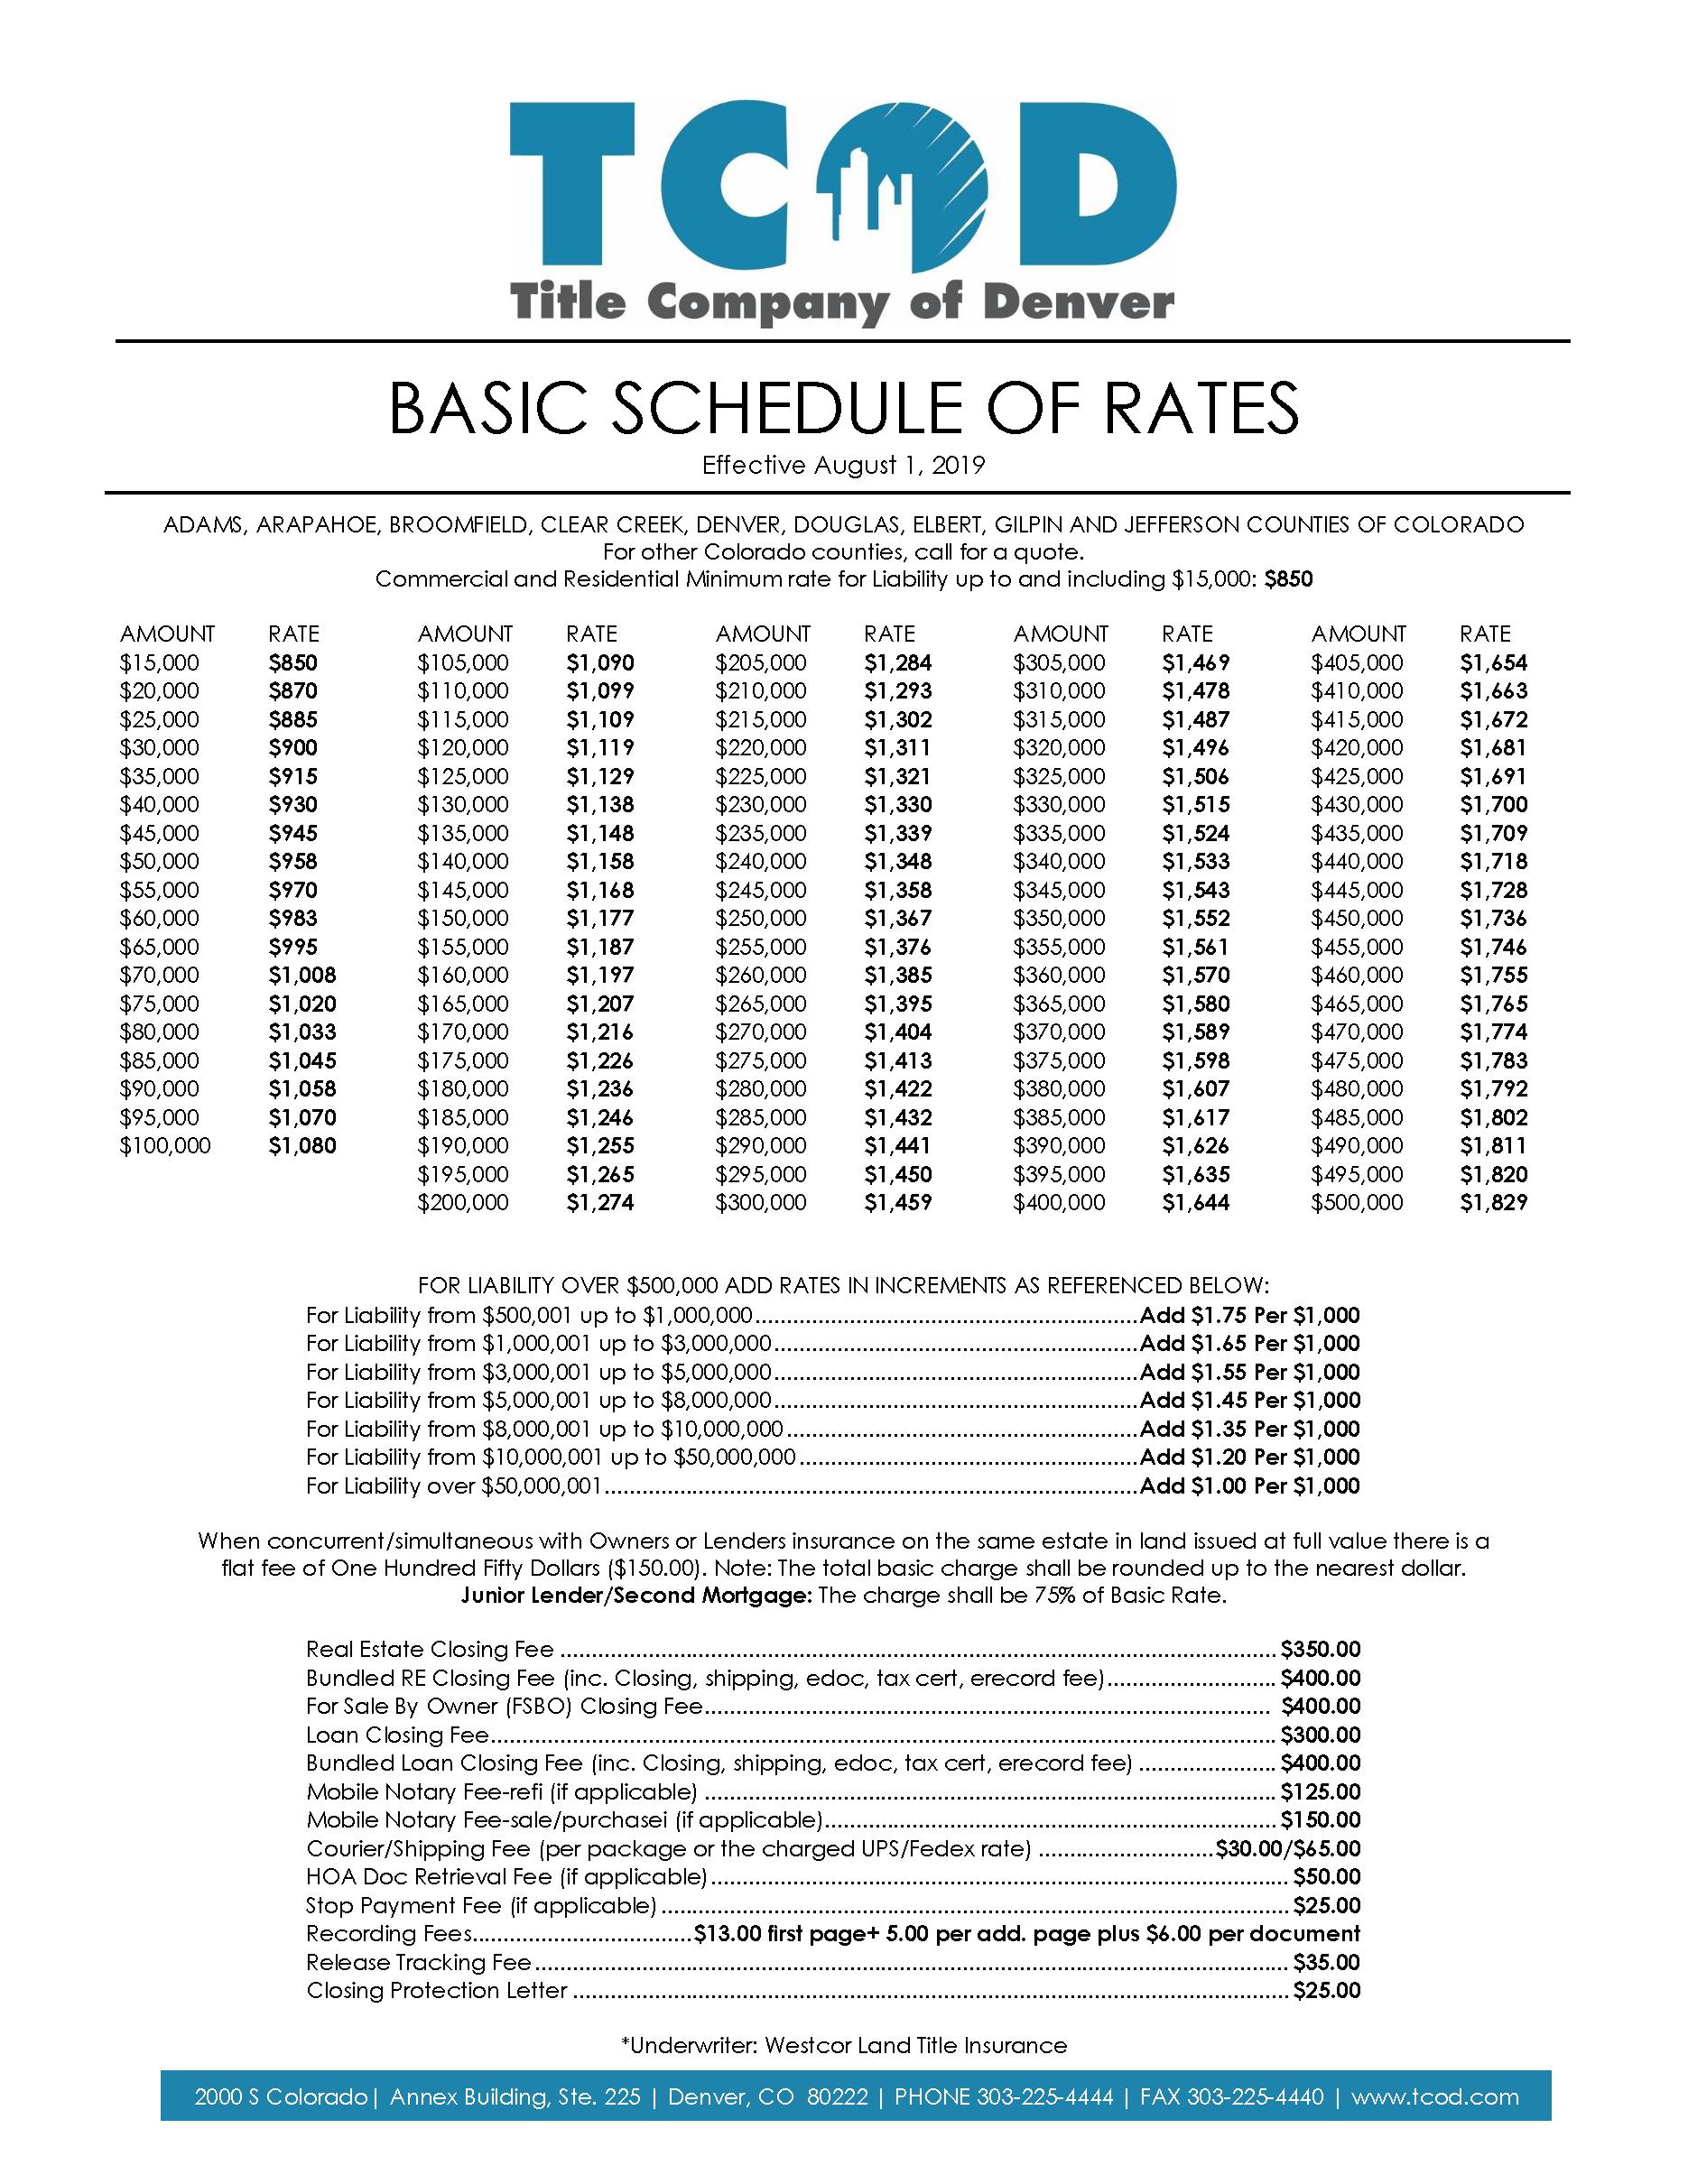 TCOD_BasicRates-06.15.17-closing-fees-2.1.19-closing-protection-08.01.19